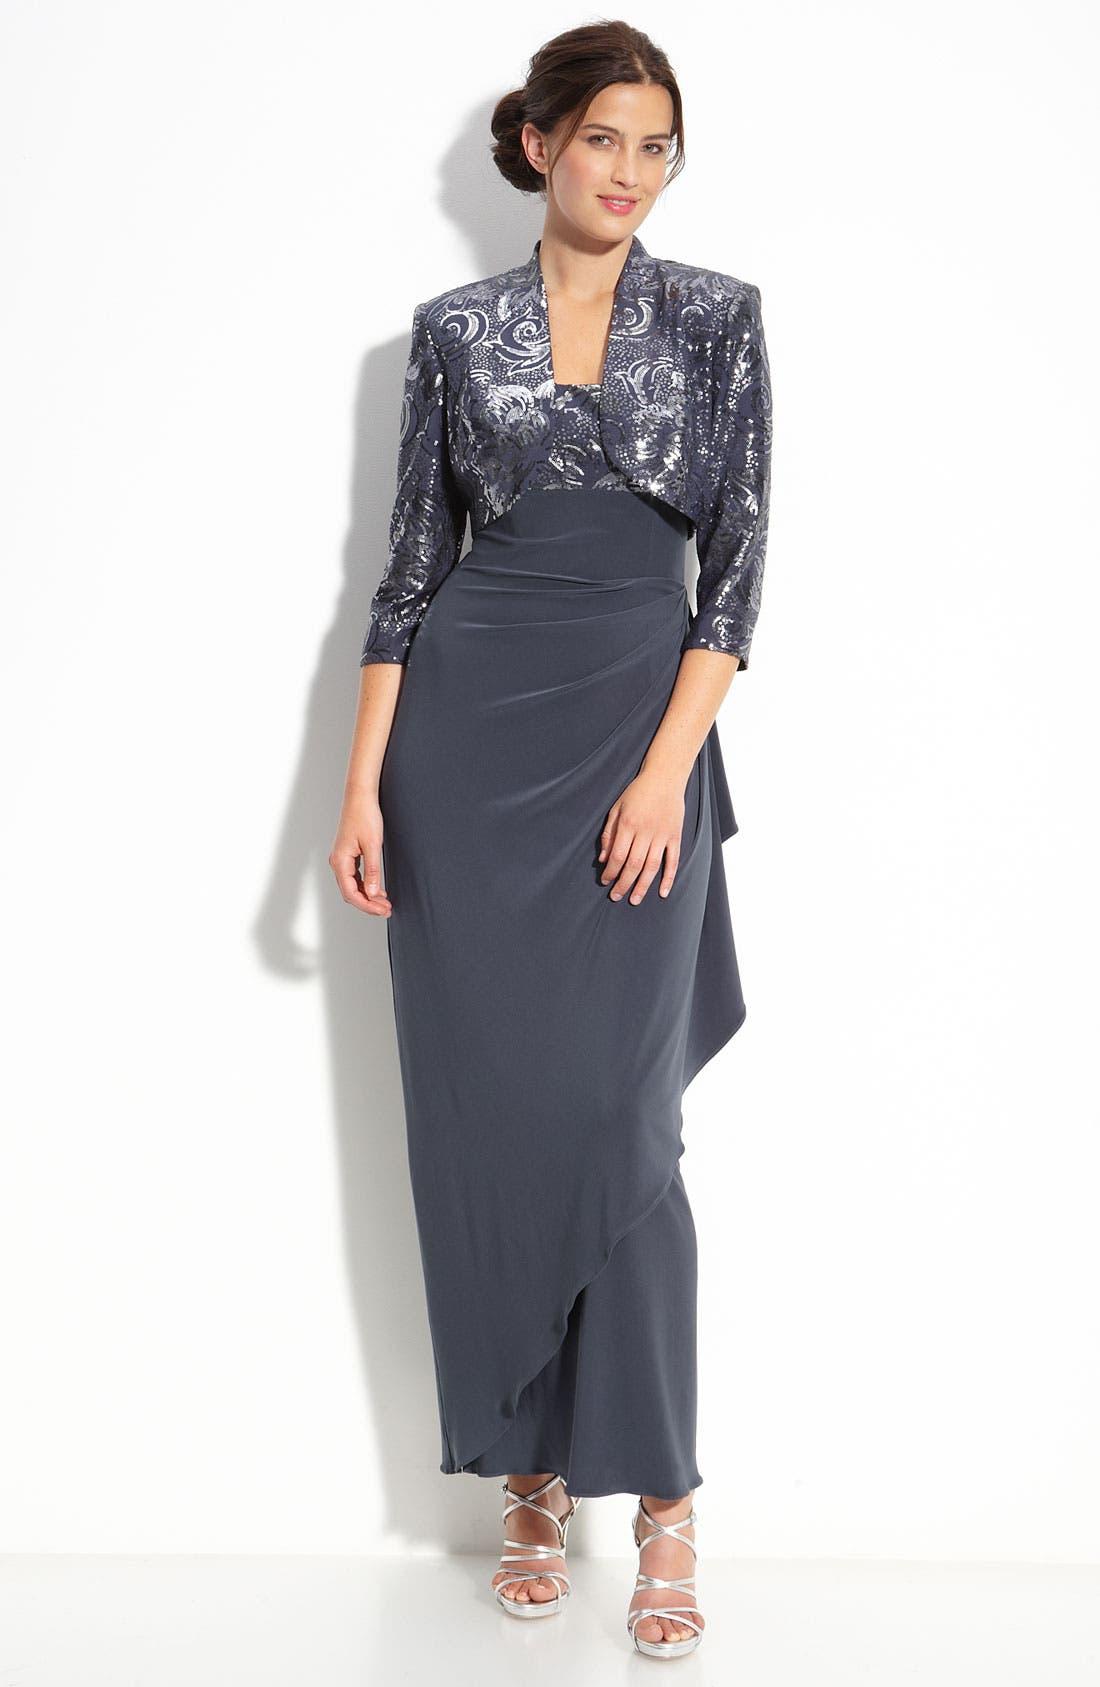 Alternate Image 1 Selected - Alex Evenings Sequin Jersey Gown & Bolero